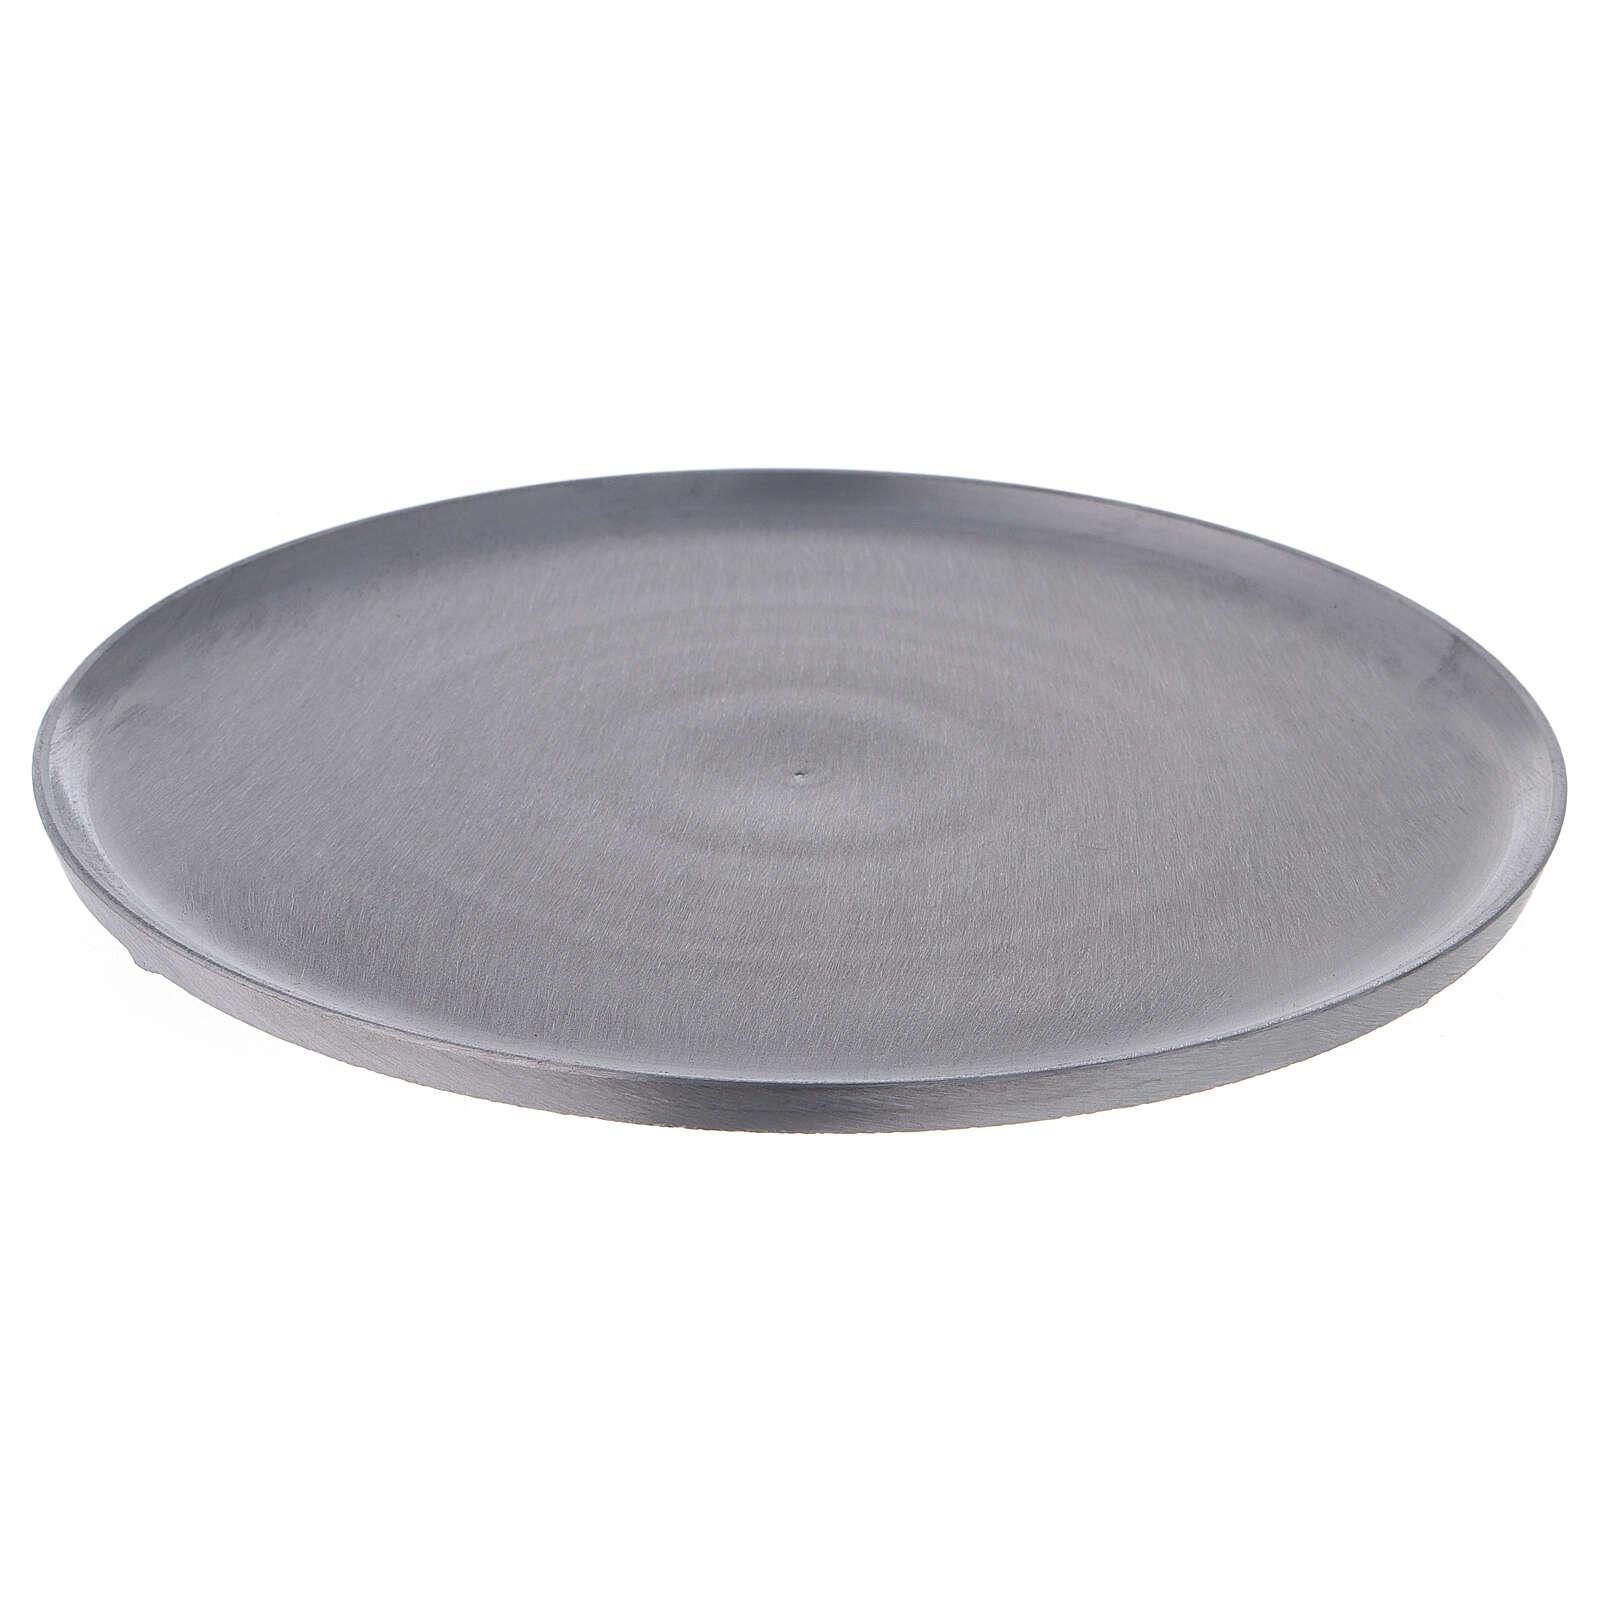 Plato redondo aluminio satinado diámetro 21 cm 3